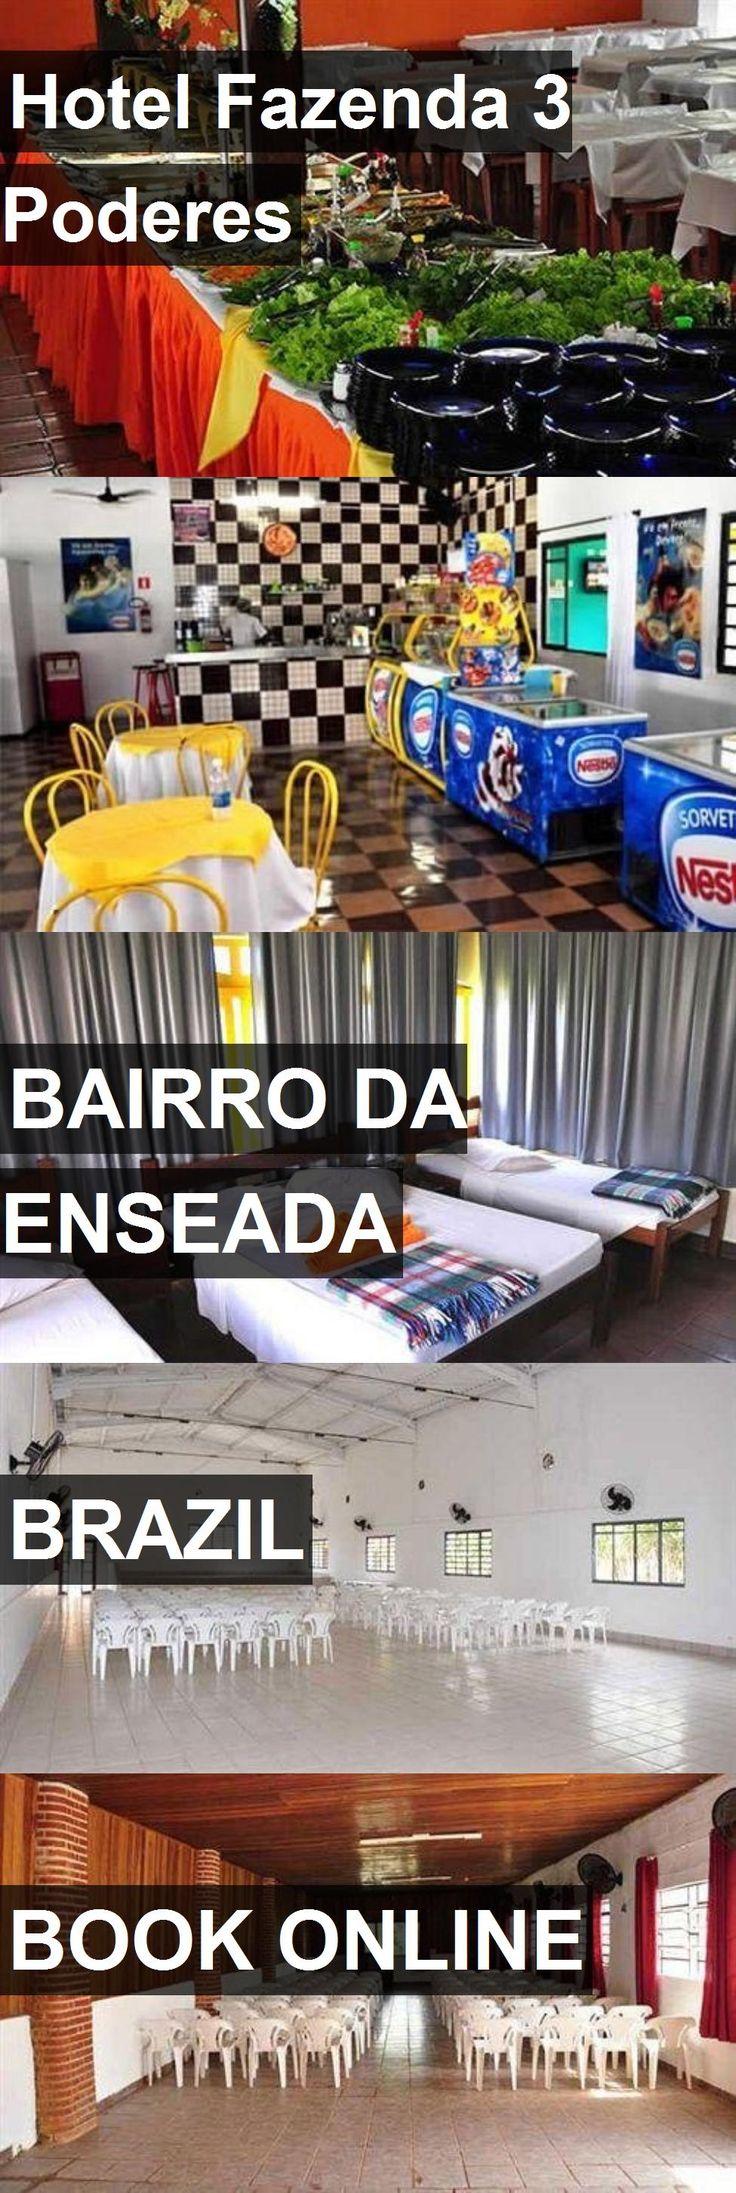 Hotel Fazenda 3 Poderes in Bairro da Enseada, Brazil. For more information, photos, reviews and best prices please follow the link. #Brazil #BairrodaEnseada #travel #vacation #hotel